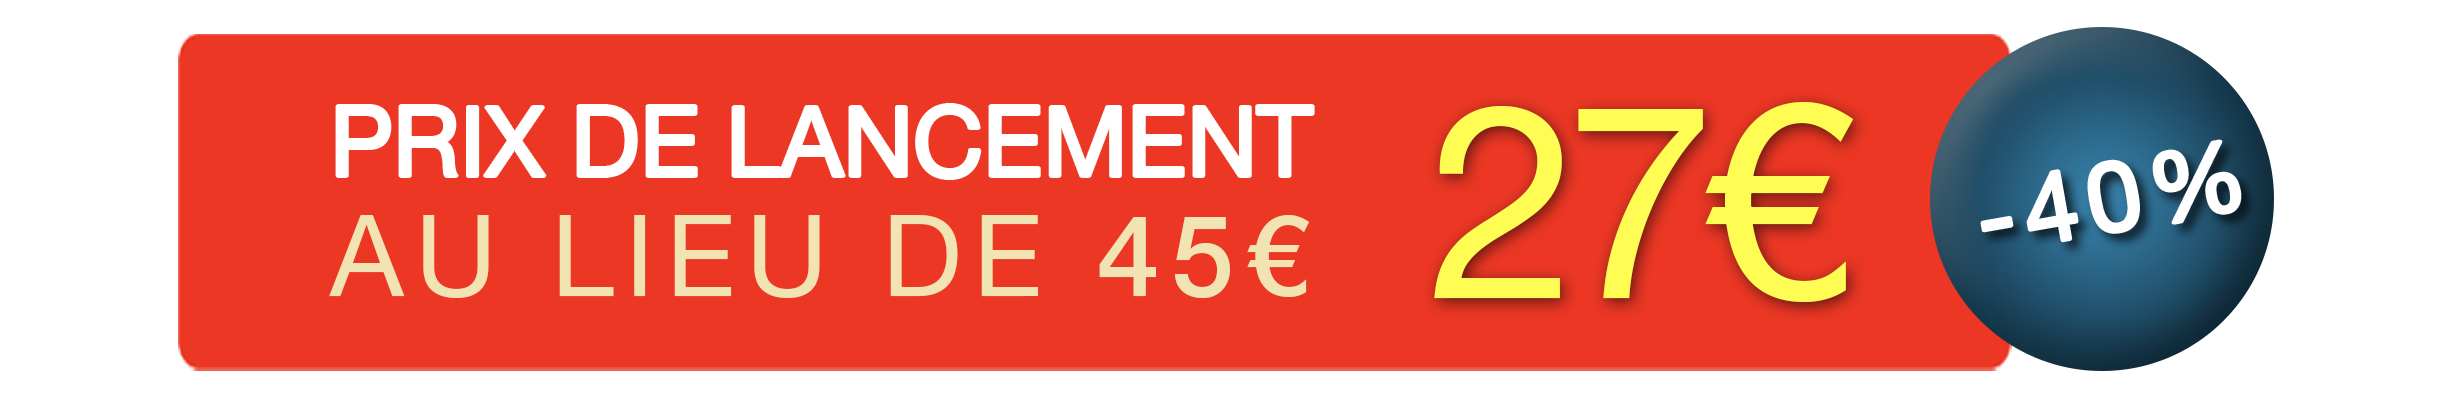 LLM20 PDV -40% 27€